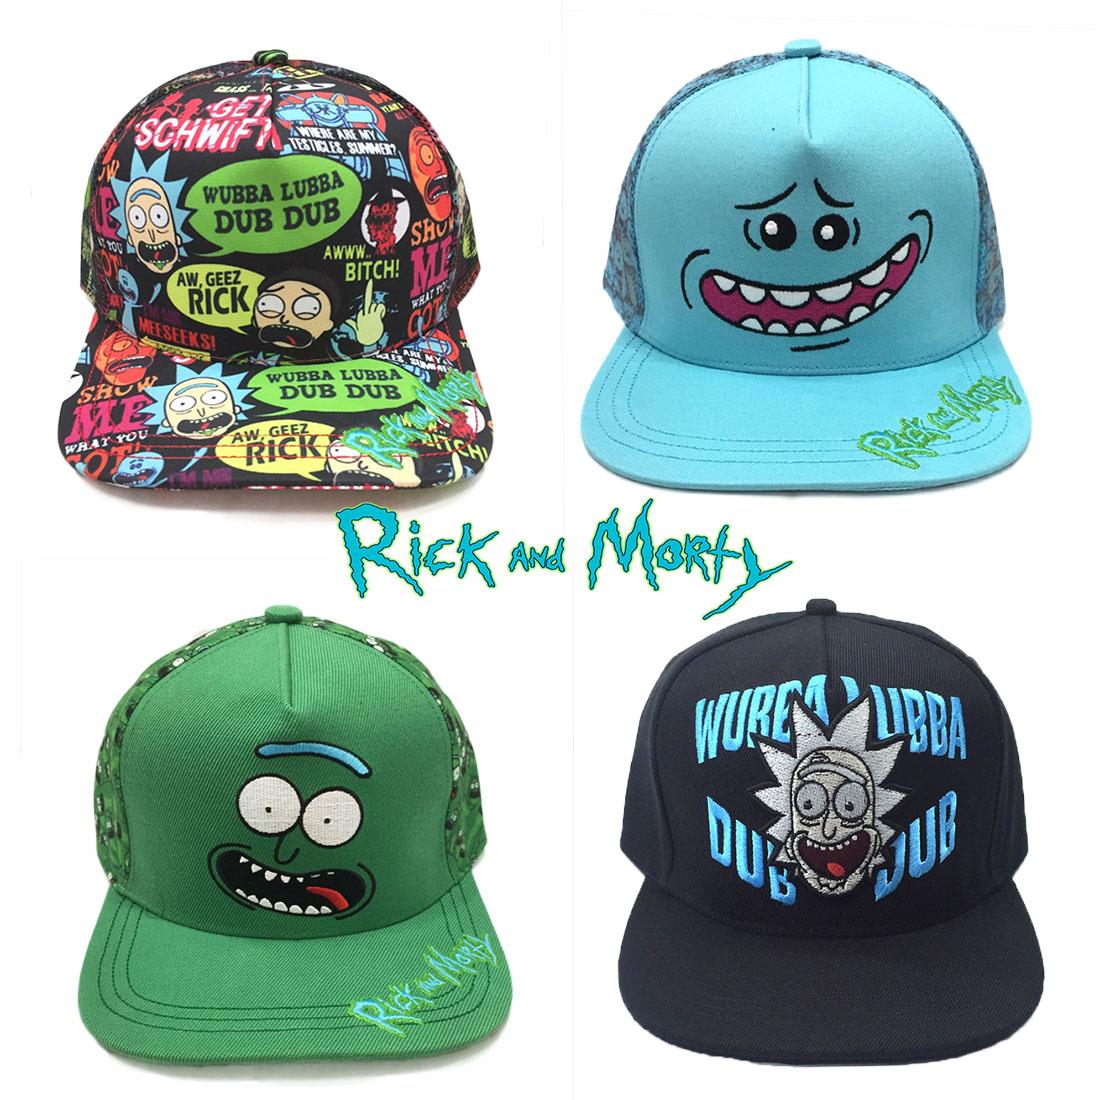 Pickle Rick Costume Hat Rick And Morty Cap Hats 2019  9e1fc18a1f46